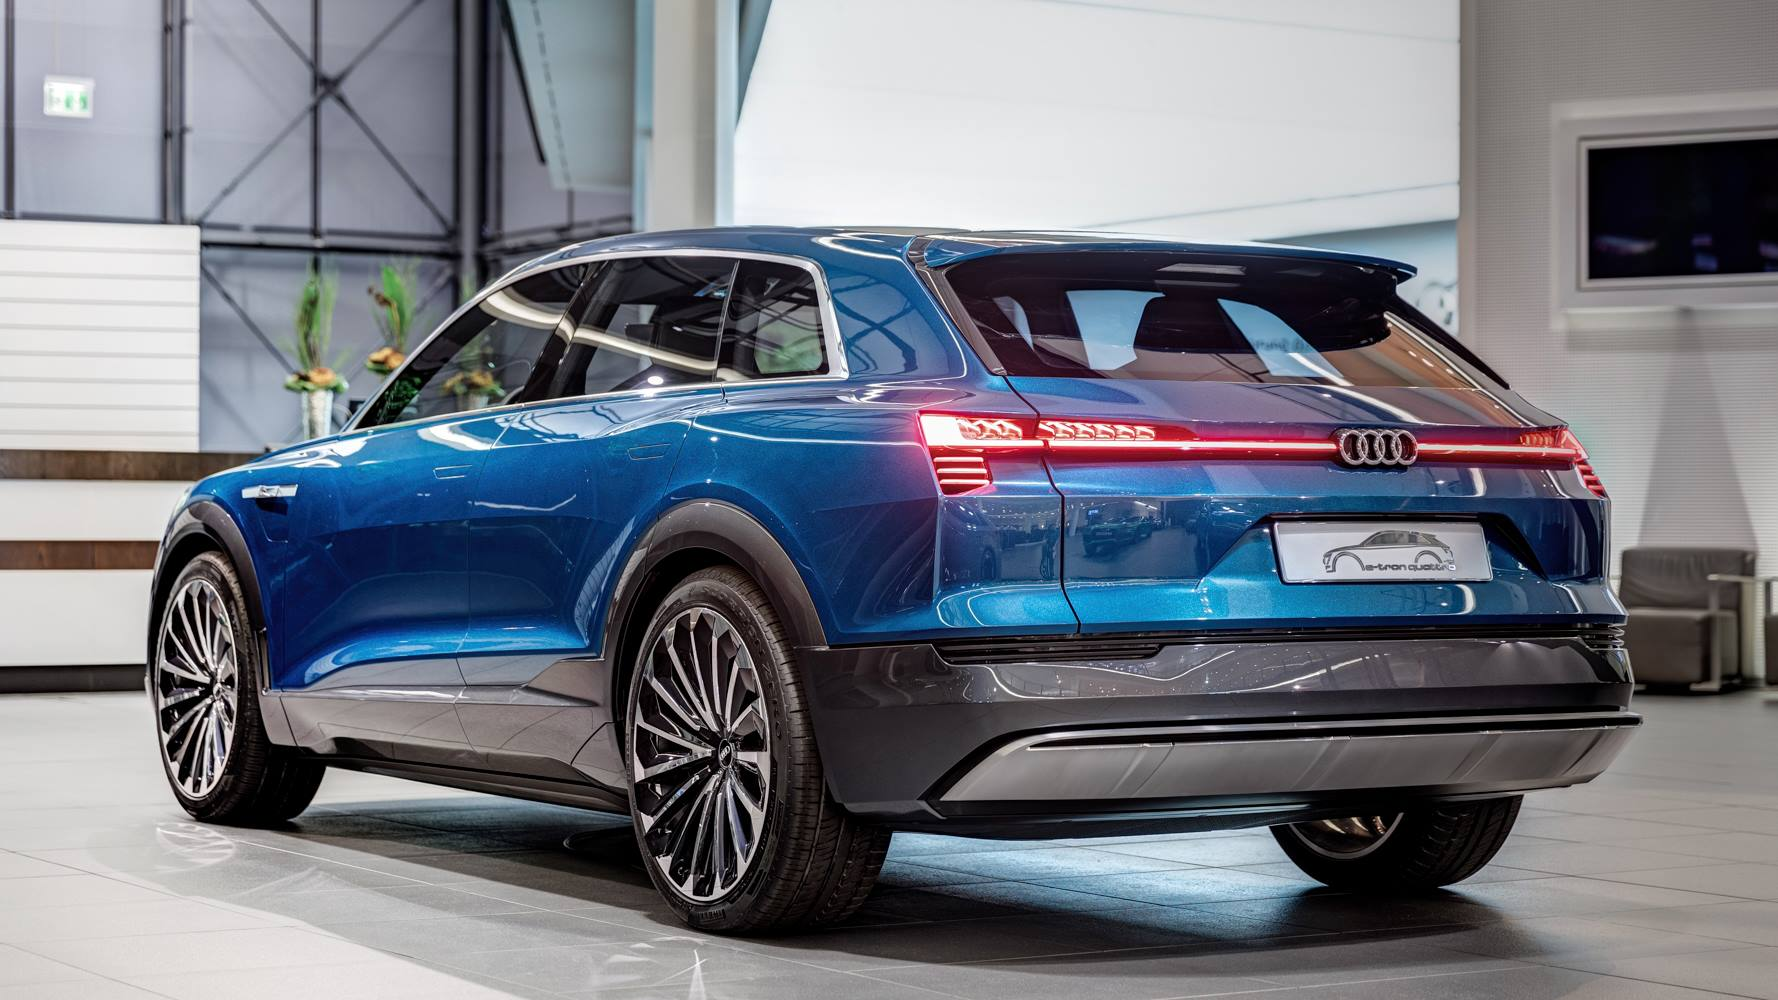 ... Audi E Tron Quattro Concept Arrives At Audi Forum Neckarsulm ...